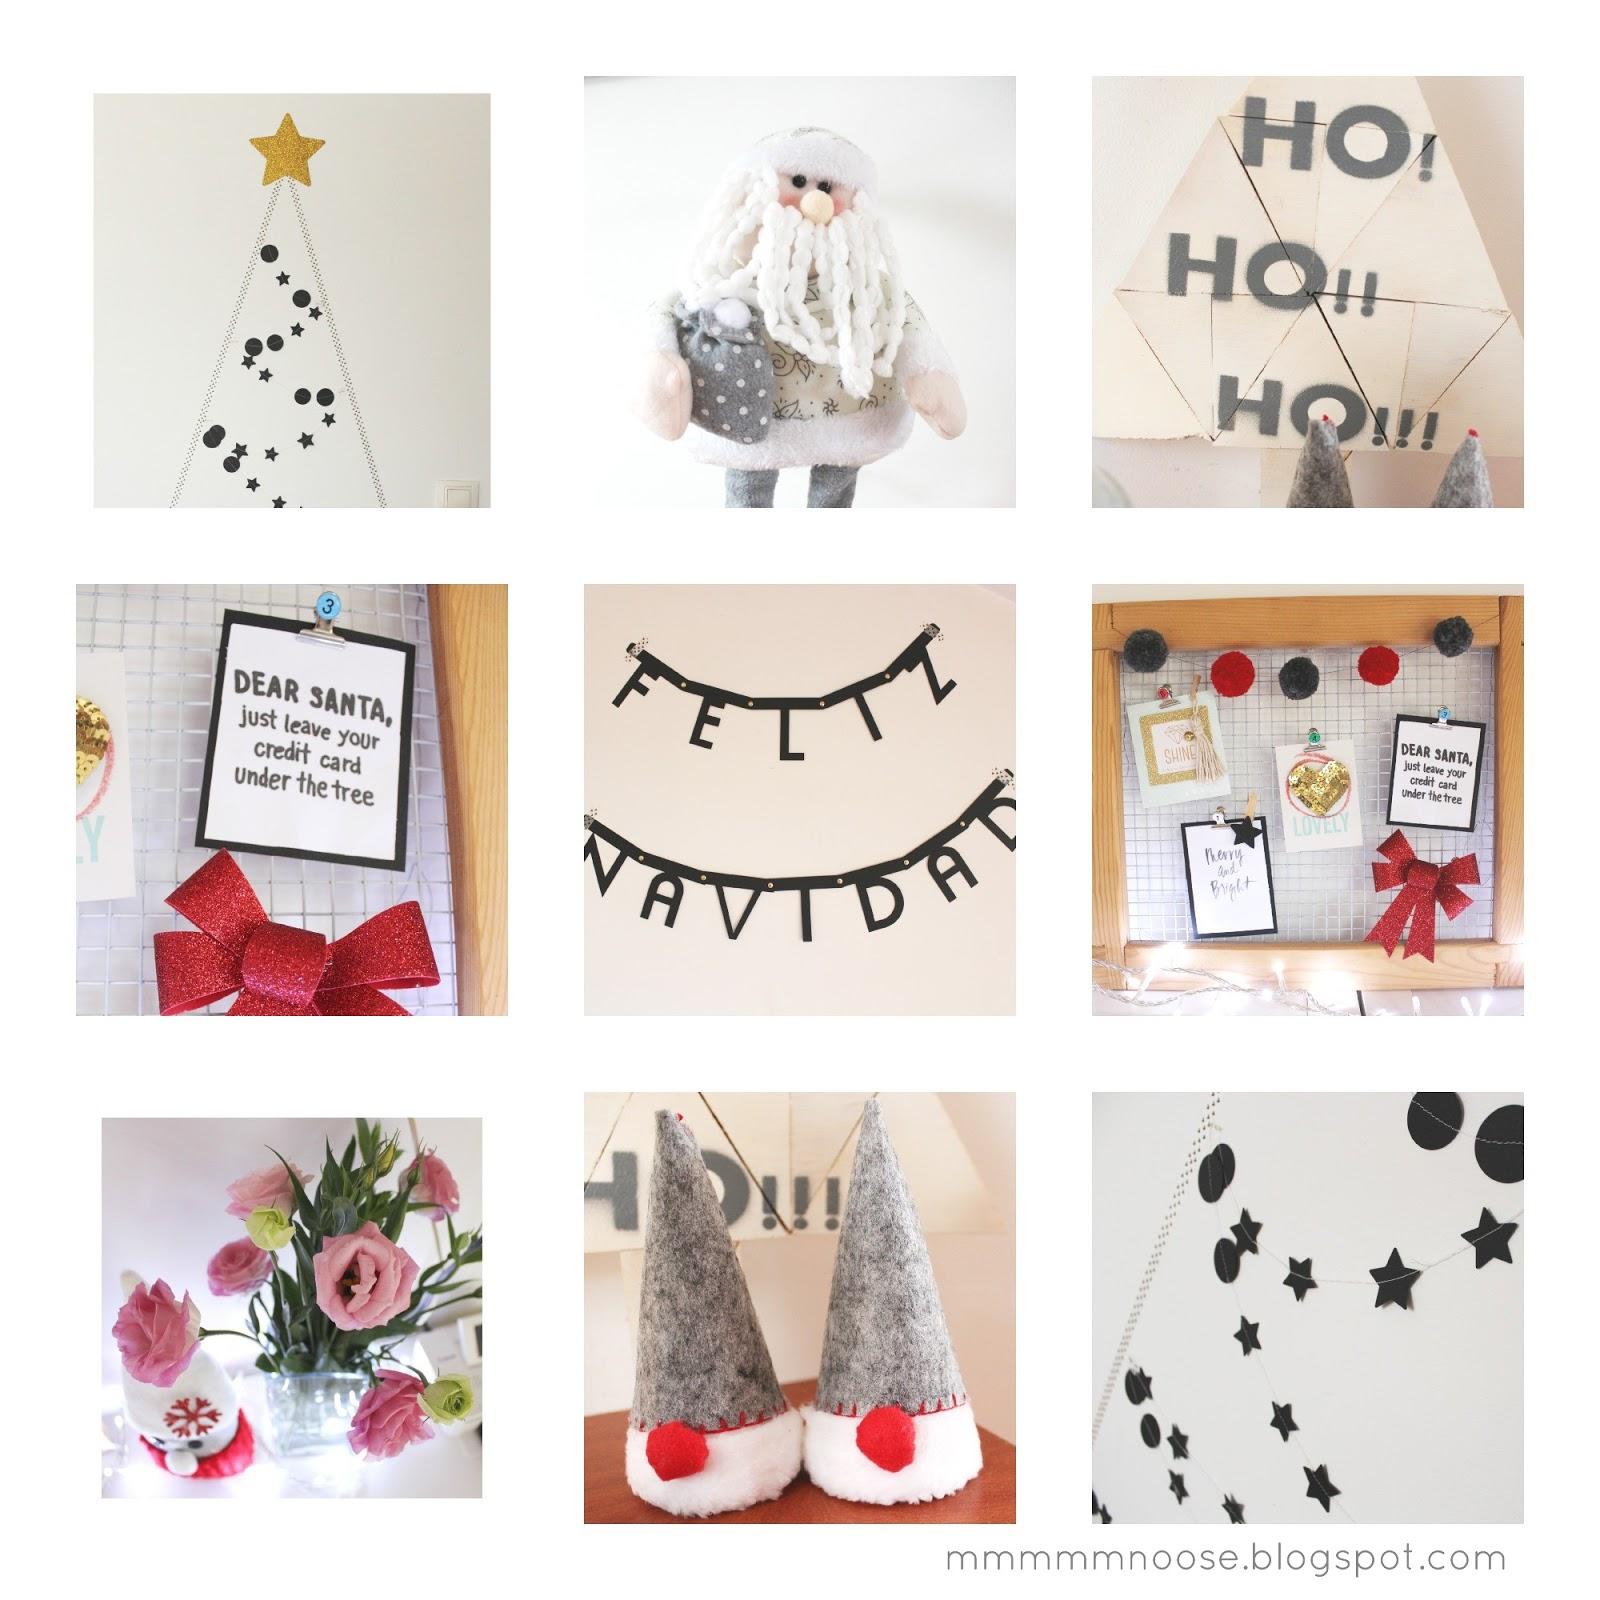 Mmmmmdeco decoraci n navide a para casas peque as - Decoracion navidena diy ...